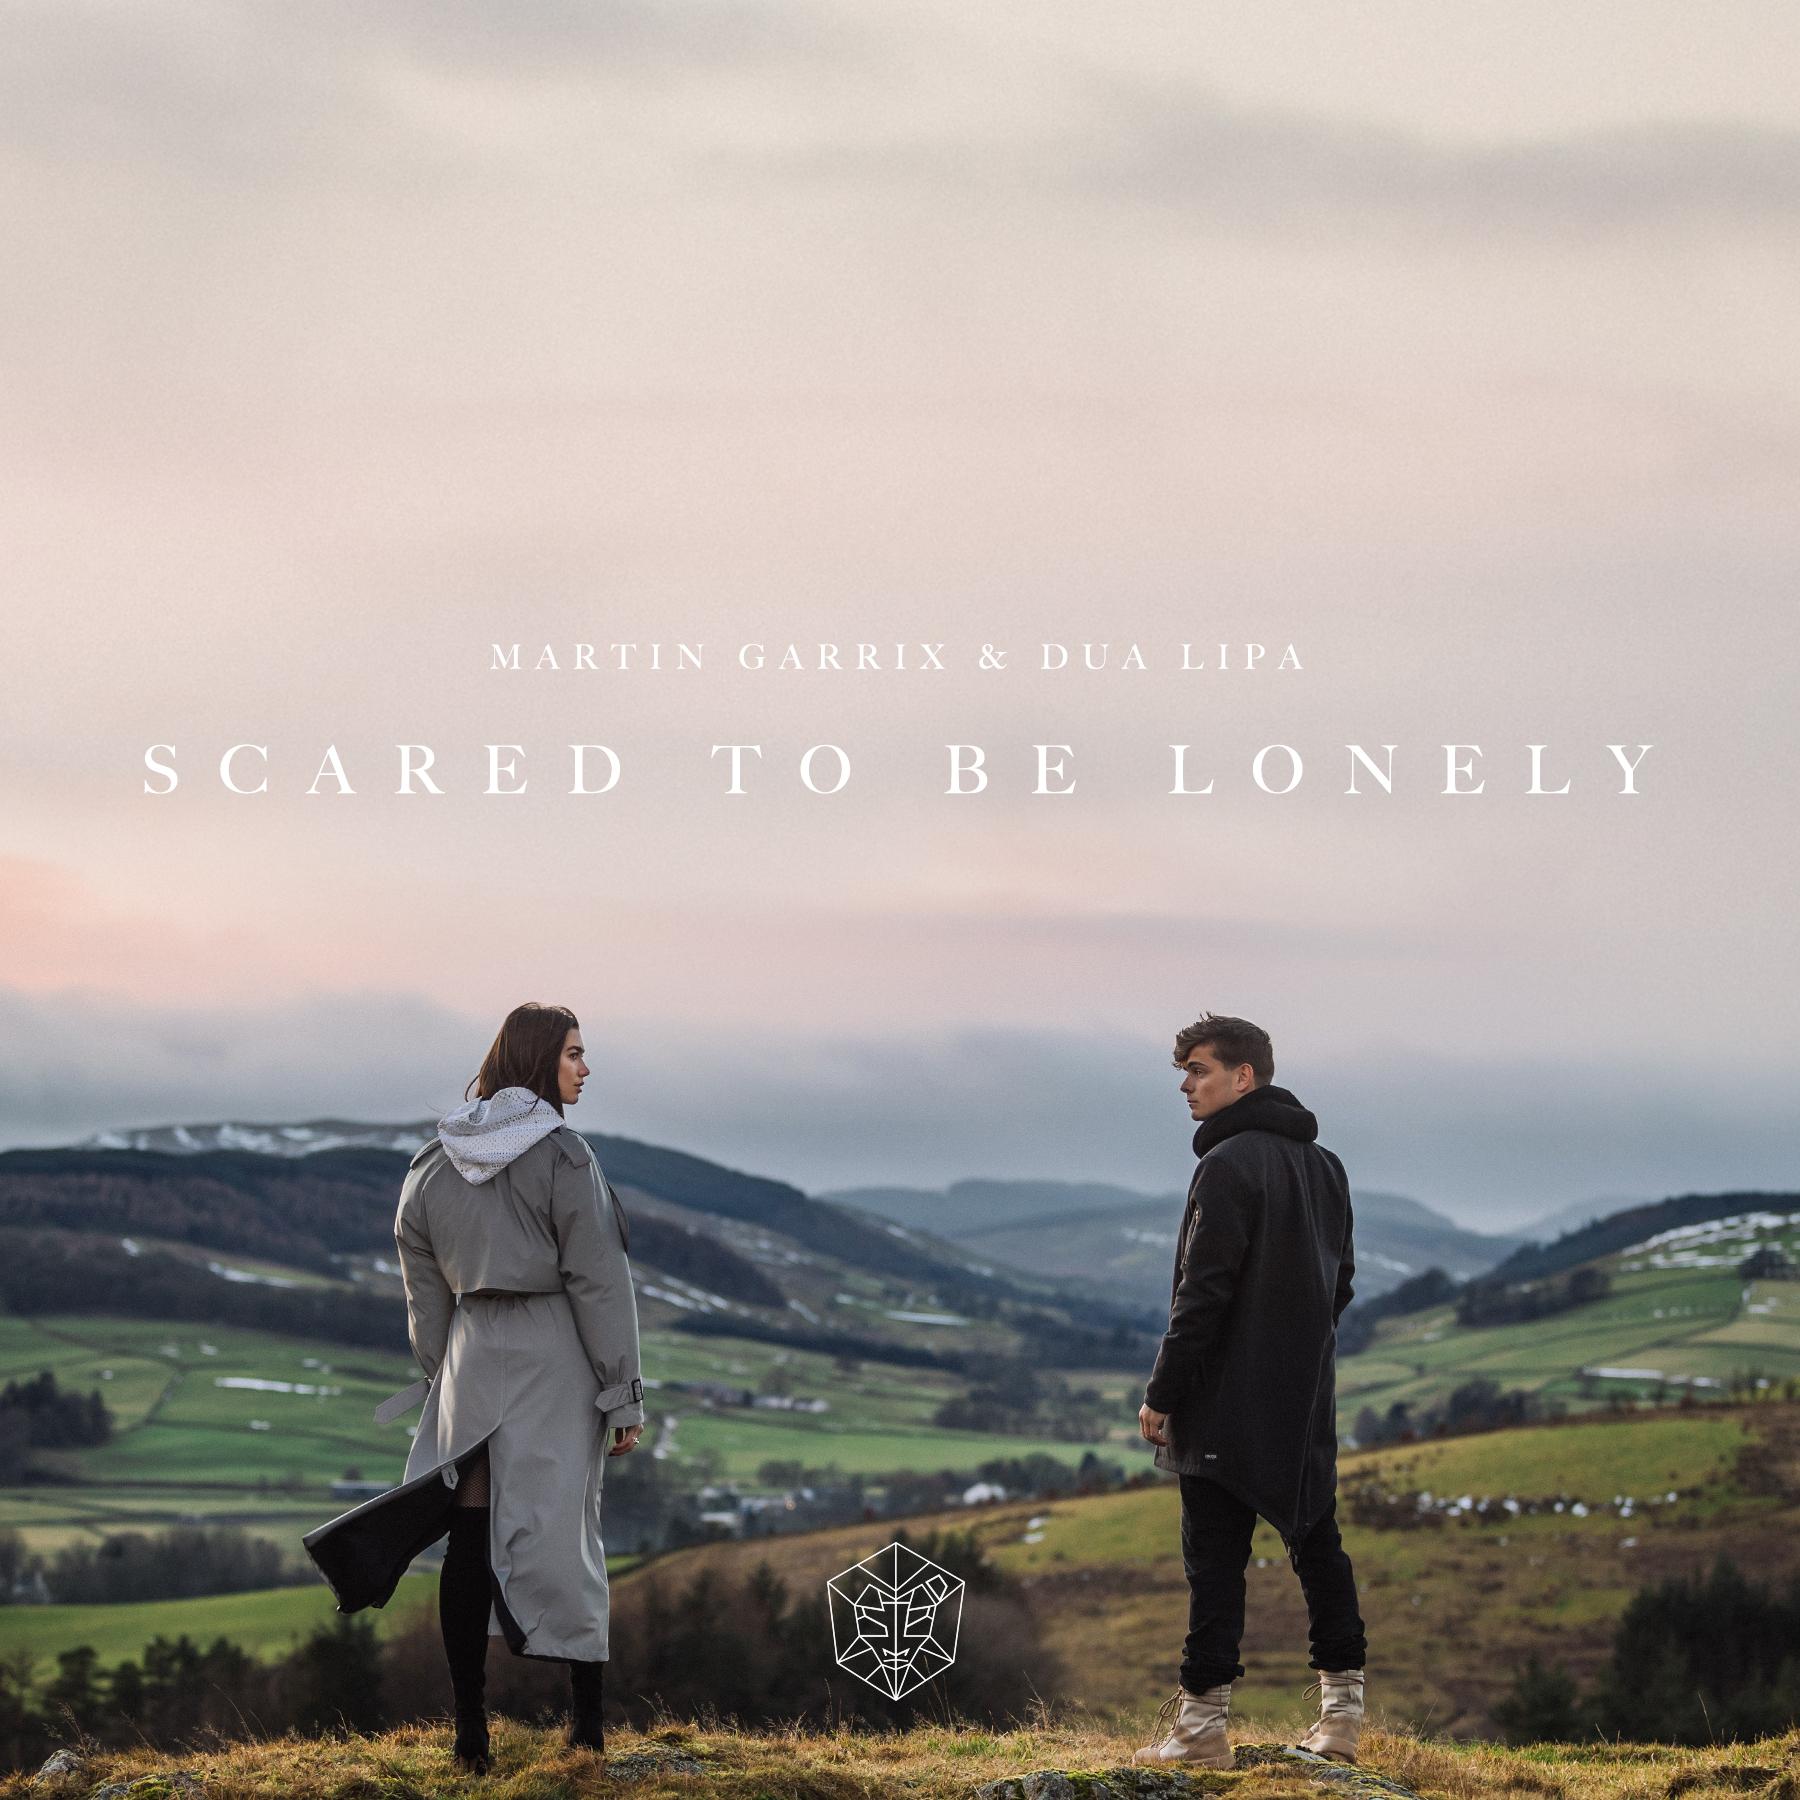 Martin Garrix & Dua Lipa Scared To Be Lonely single artwork